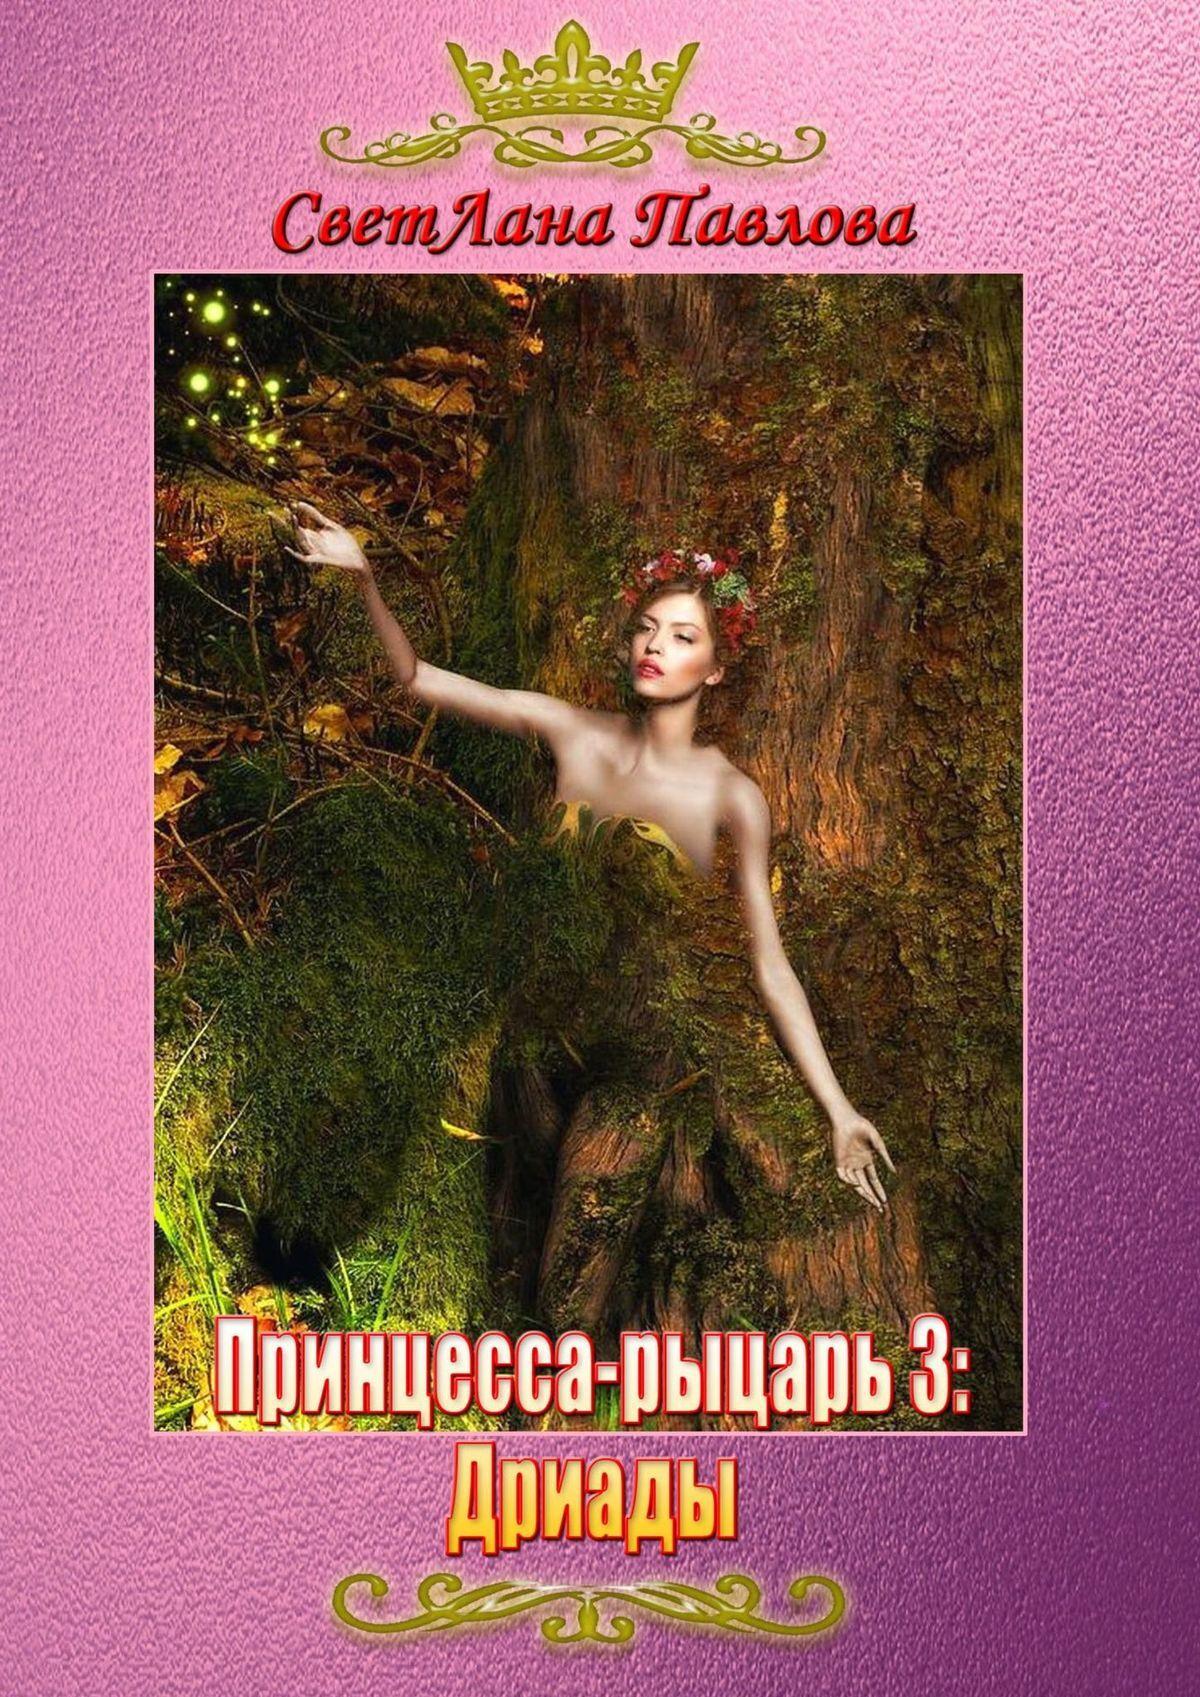 СветЛана Павлова Принцесса-рыцарь: Дриады. Книга 3 россия 00265 500 ваза дриады